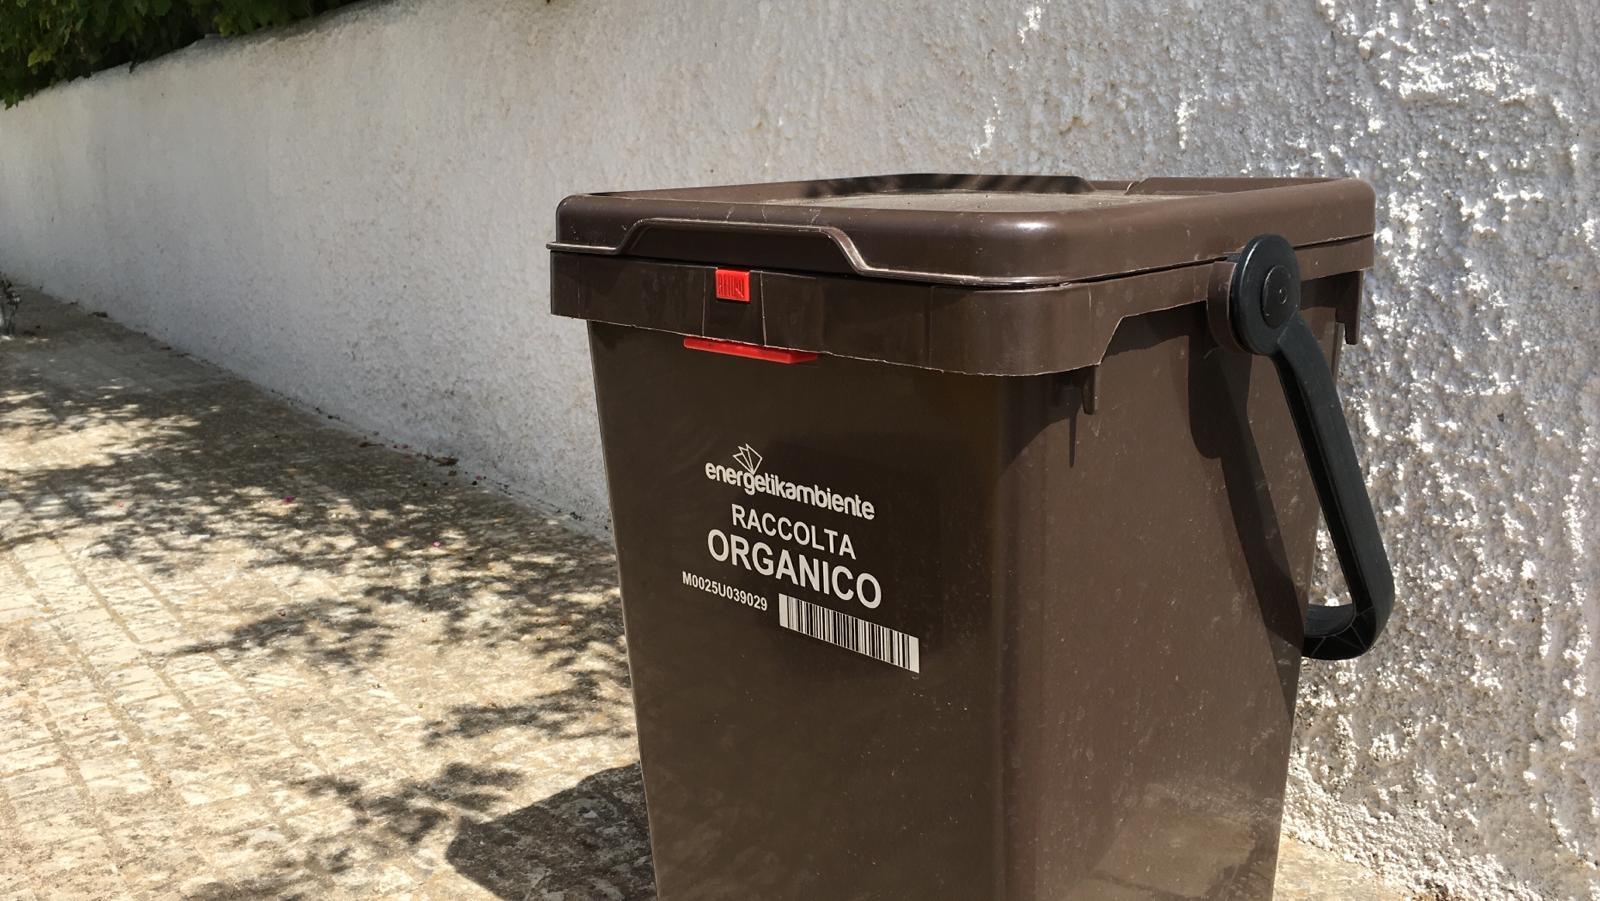 Emergenza organico a Marsala, in arrivo una nuova ordinanza sindacale